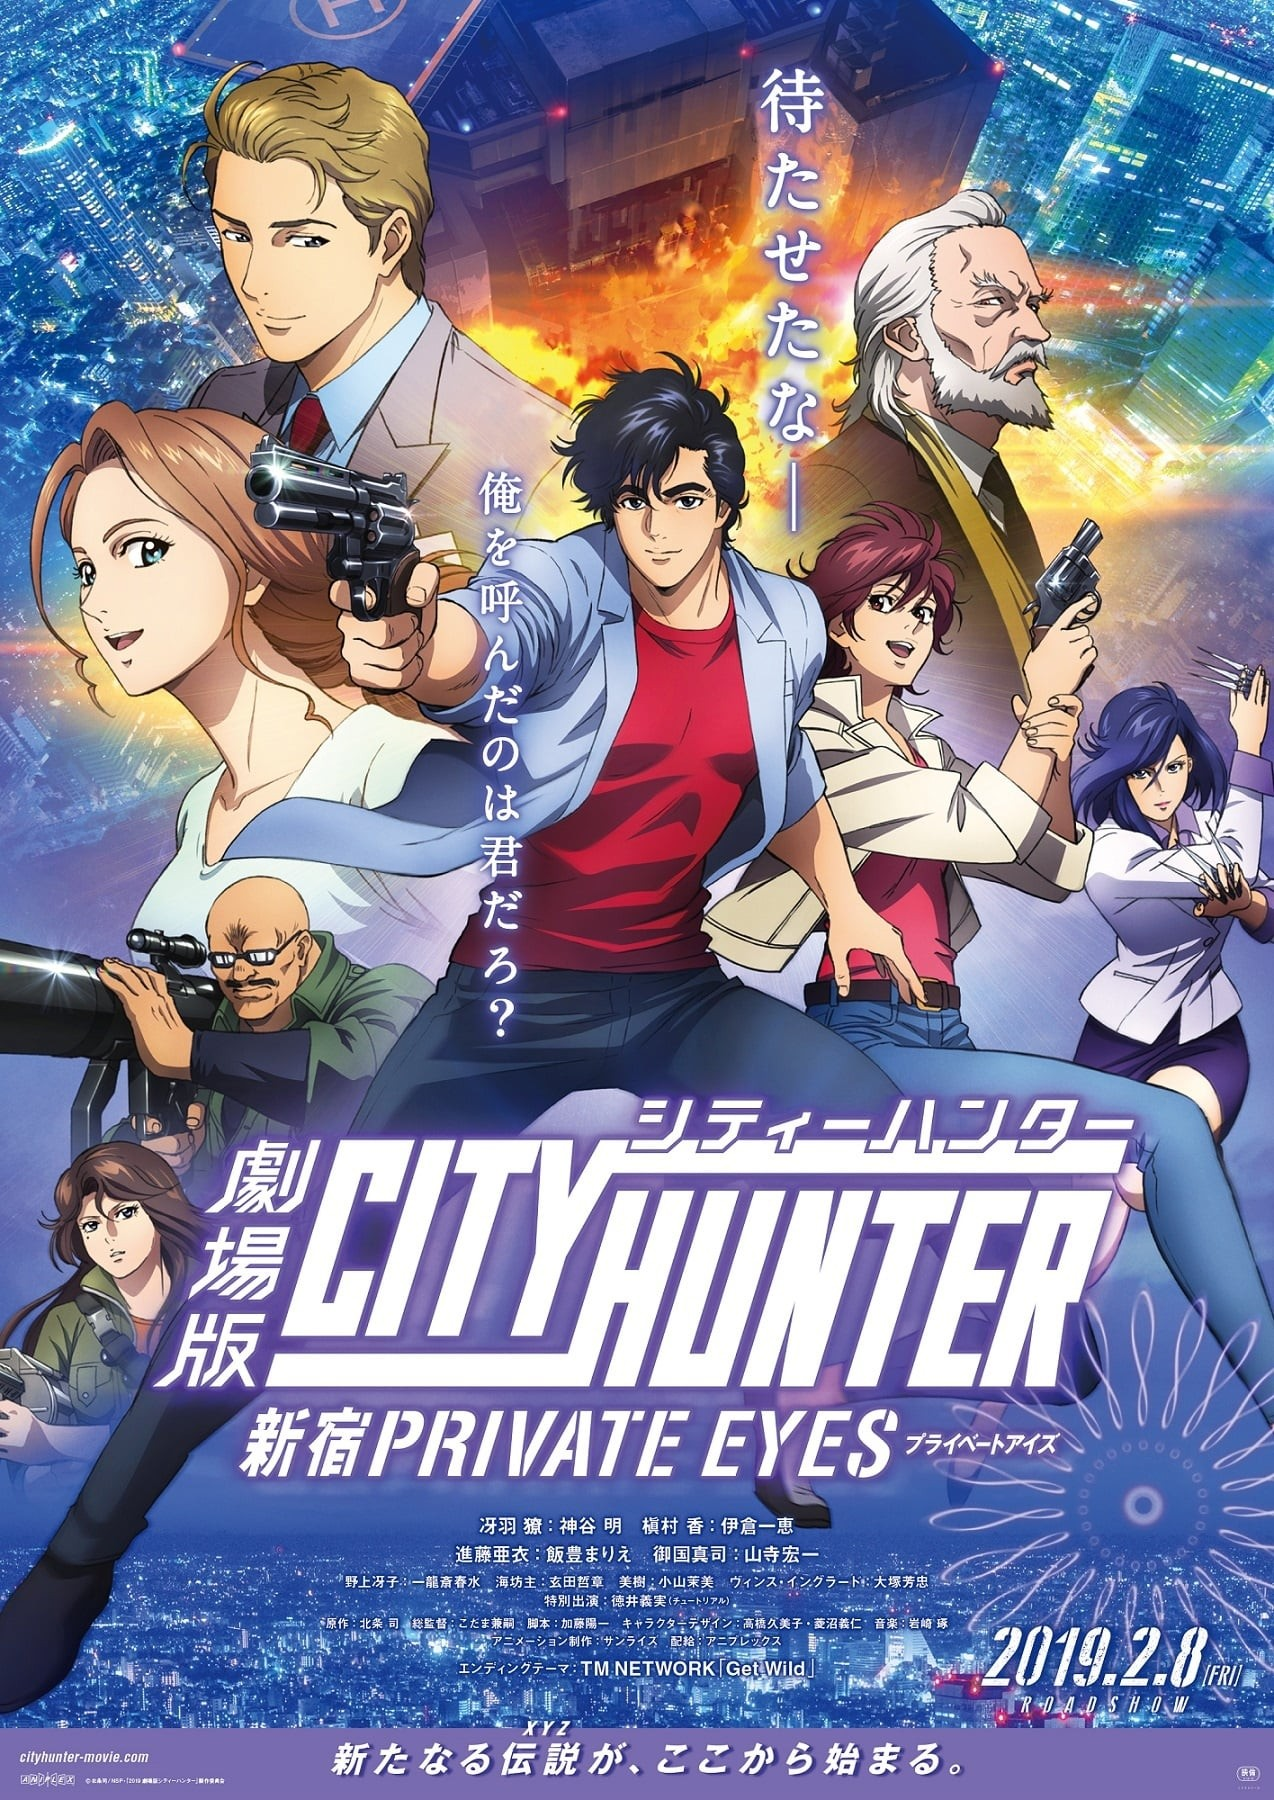 City hunter - private eyes (city hunter: shinjuku private eyes)